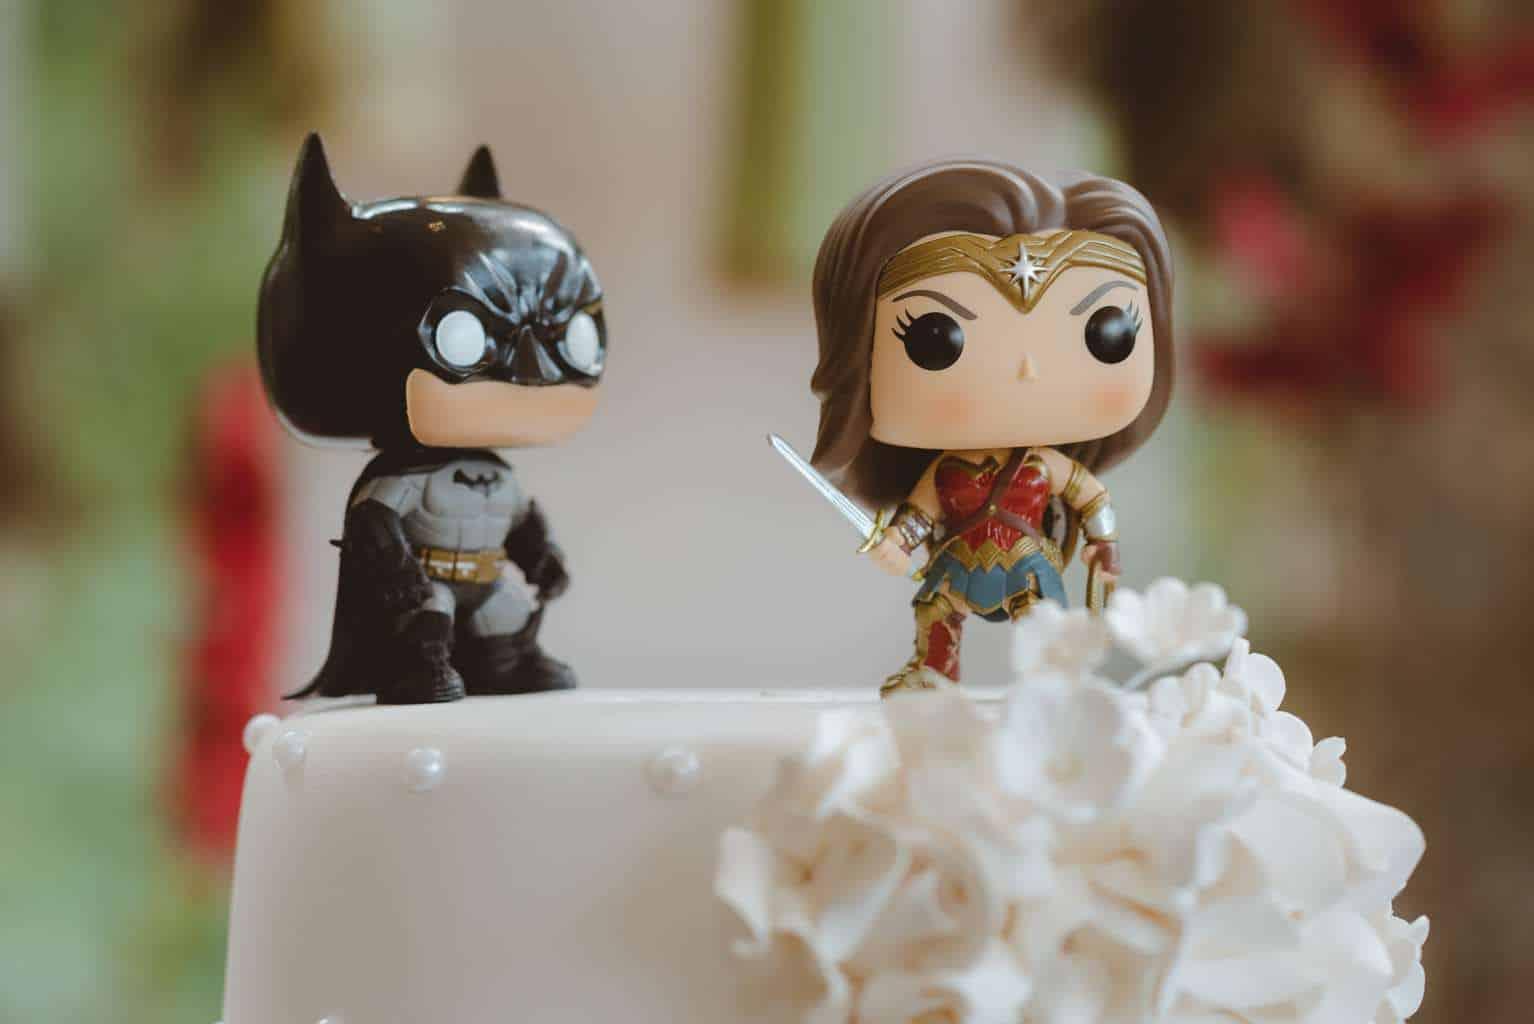 bolo-casamento-ao-ar-livre-casamento-boho-casamento-geek-casamento-rustico-casamento-Thais-e-Pedro-Revoar-Fotografia-Villa-Borghese-Eventos-71